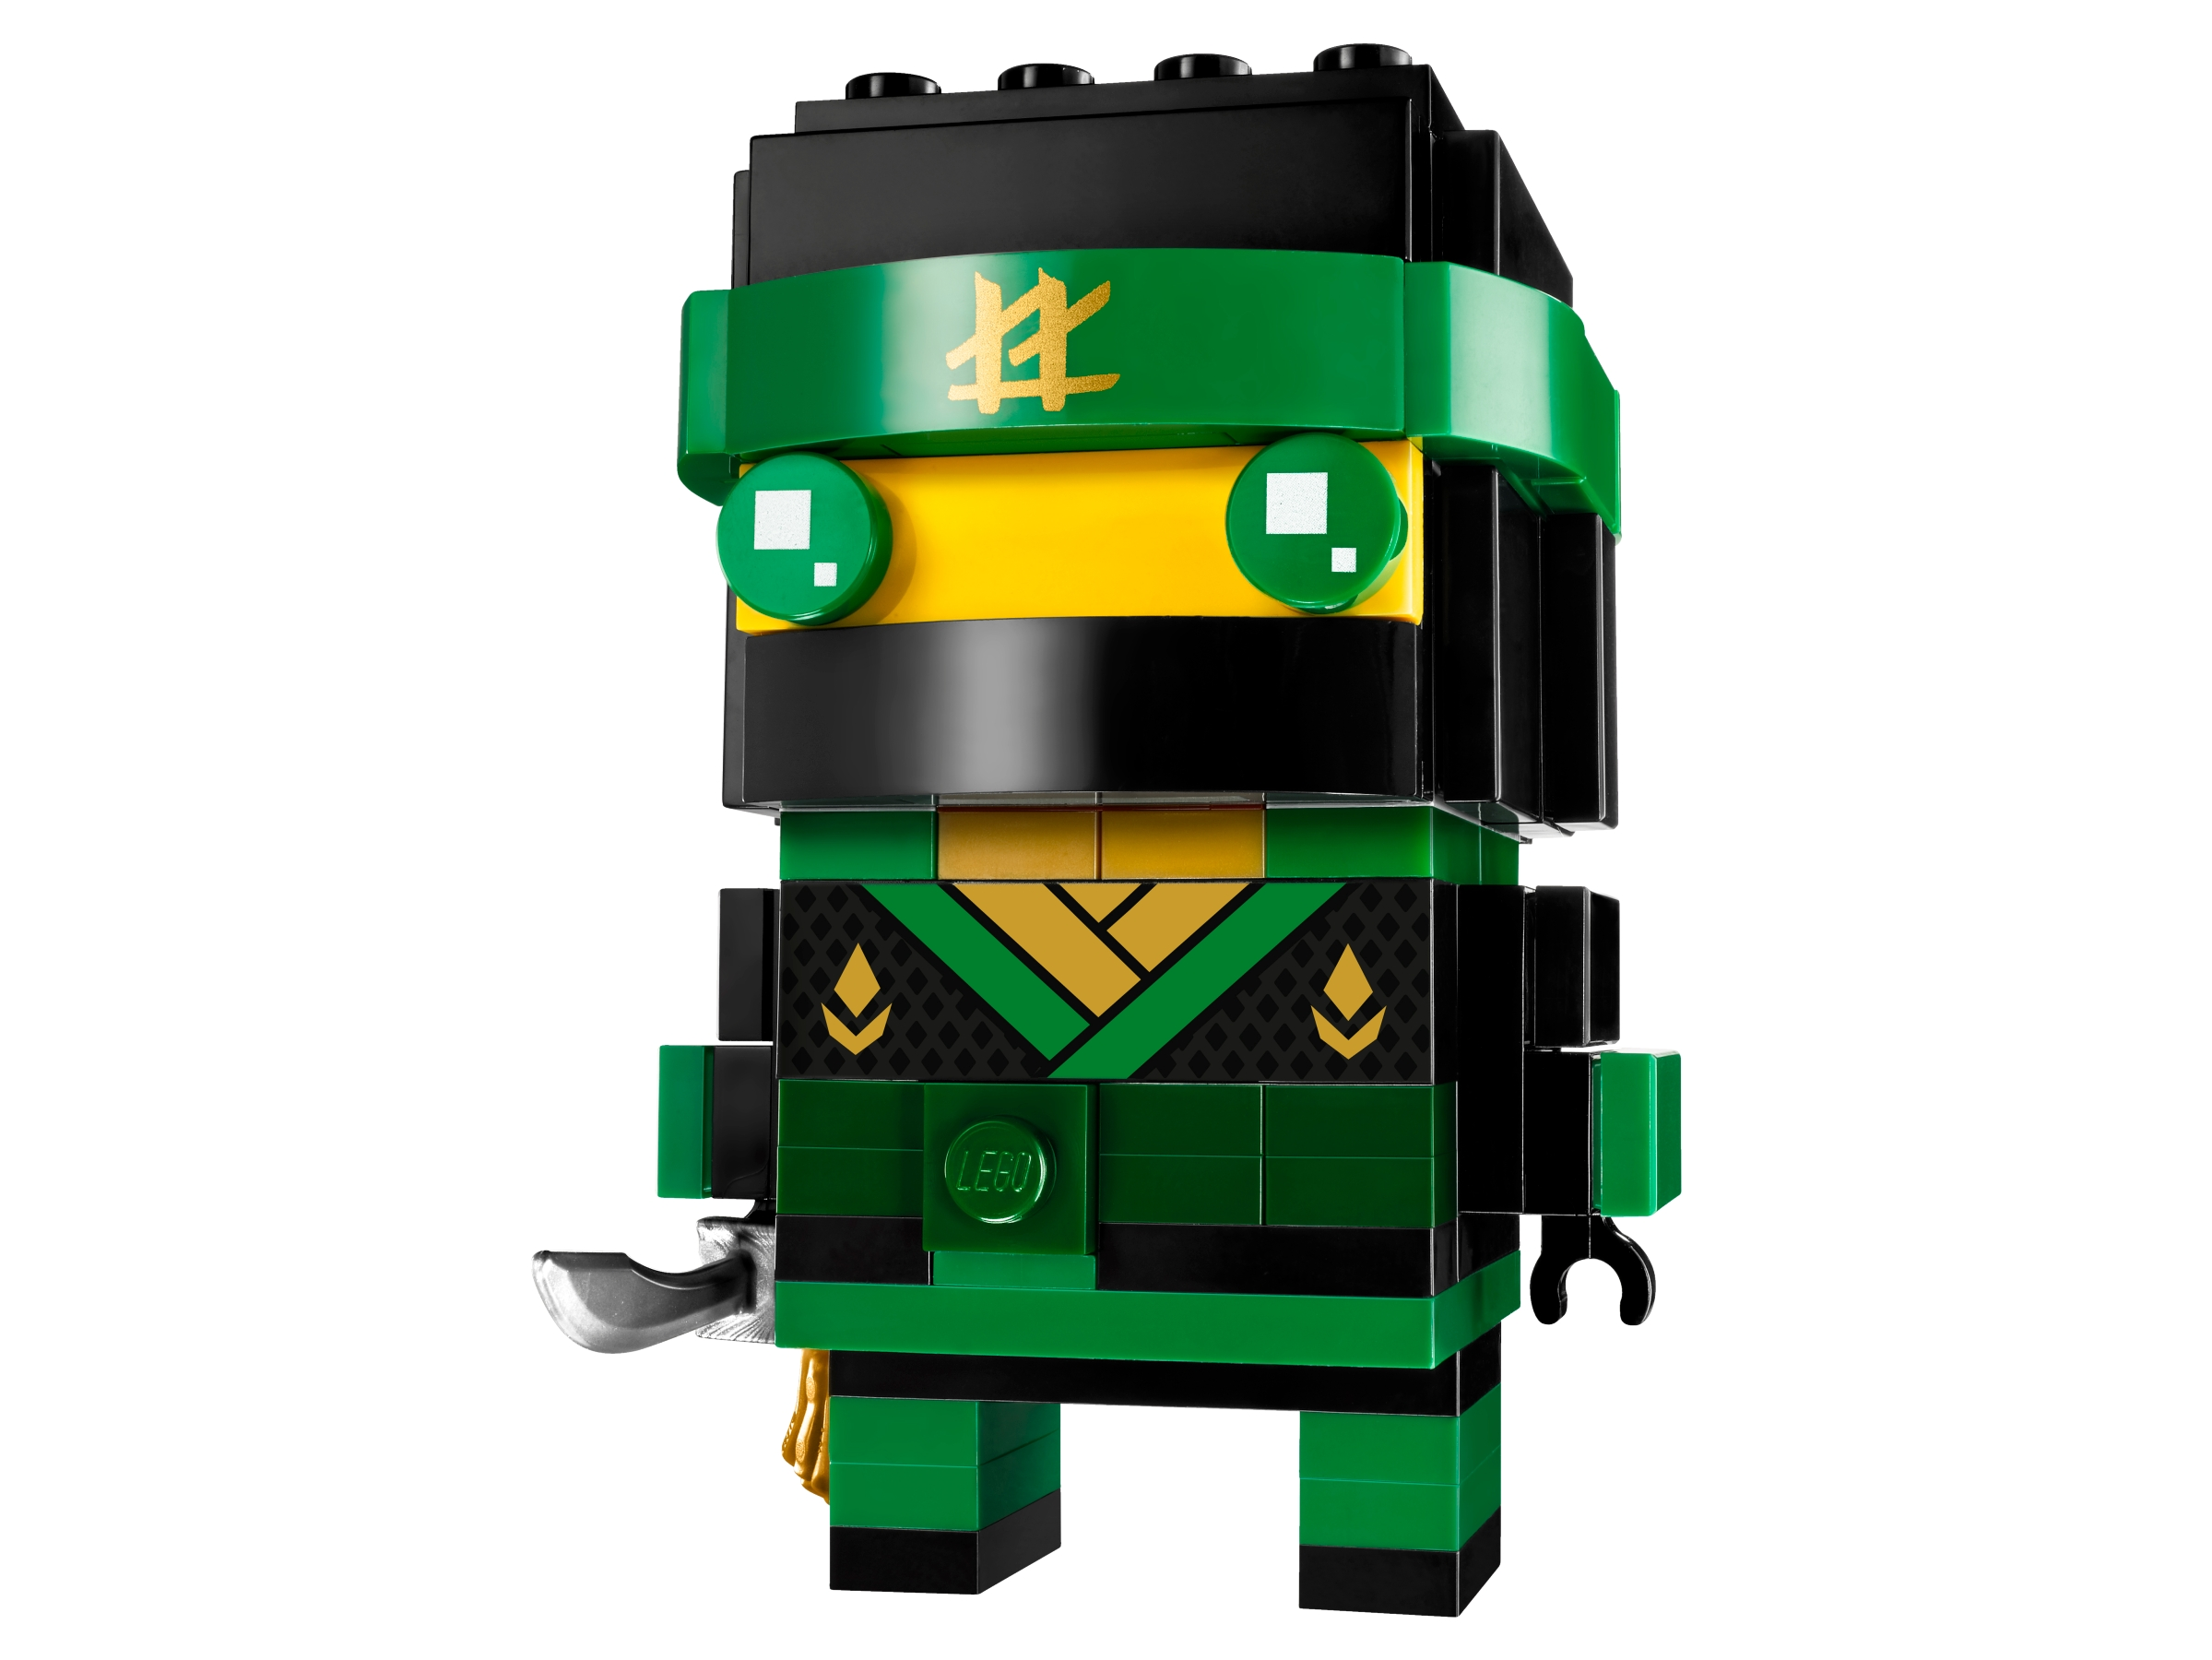 Details about  /Lego BrickHeadz 41487 Ninjago Lloyd Brand New Sealed